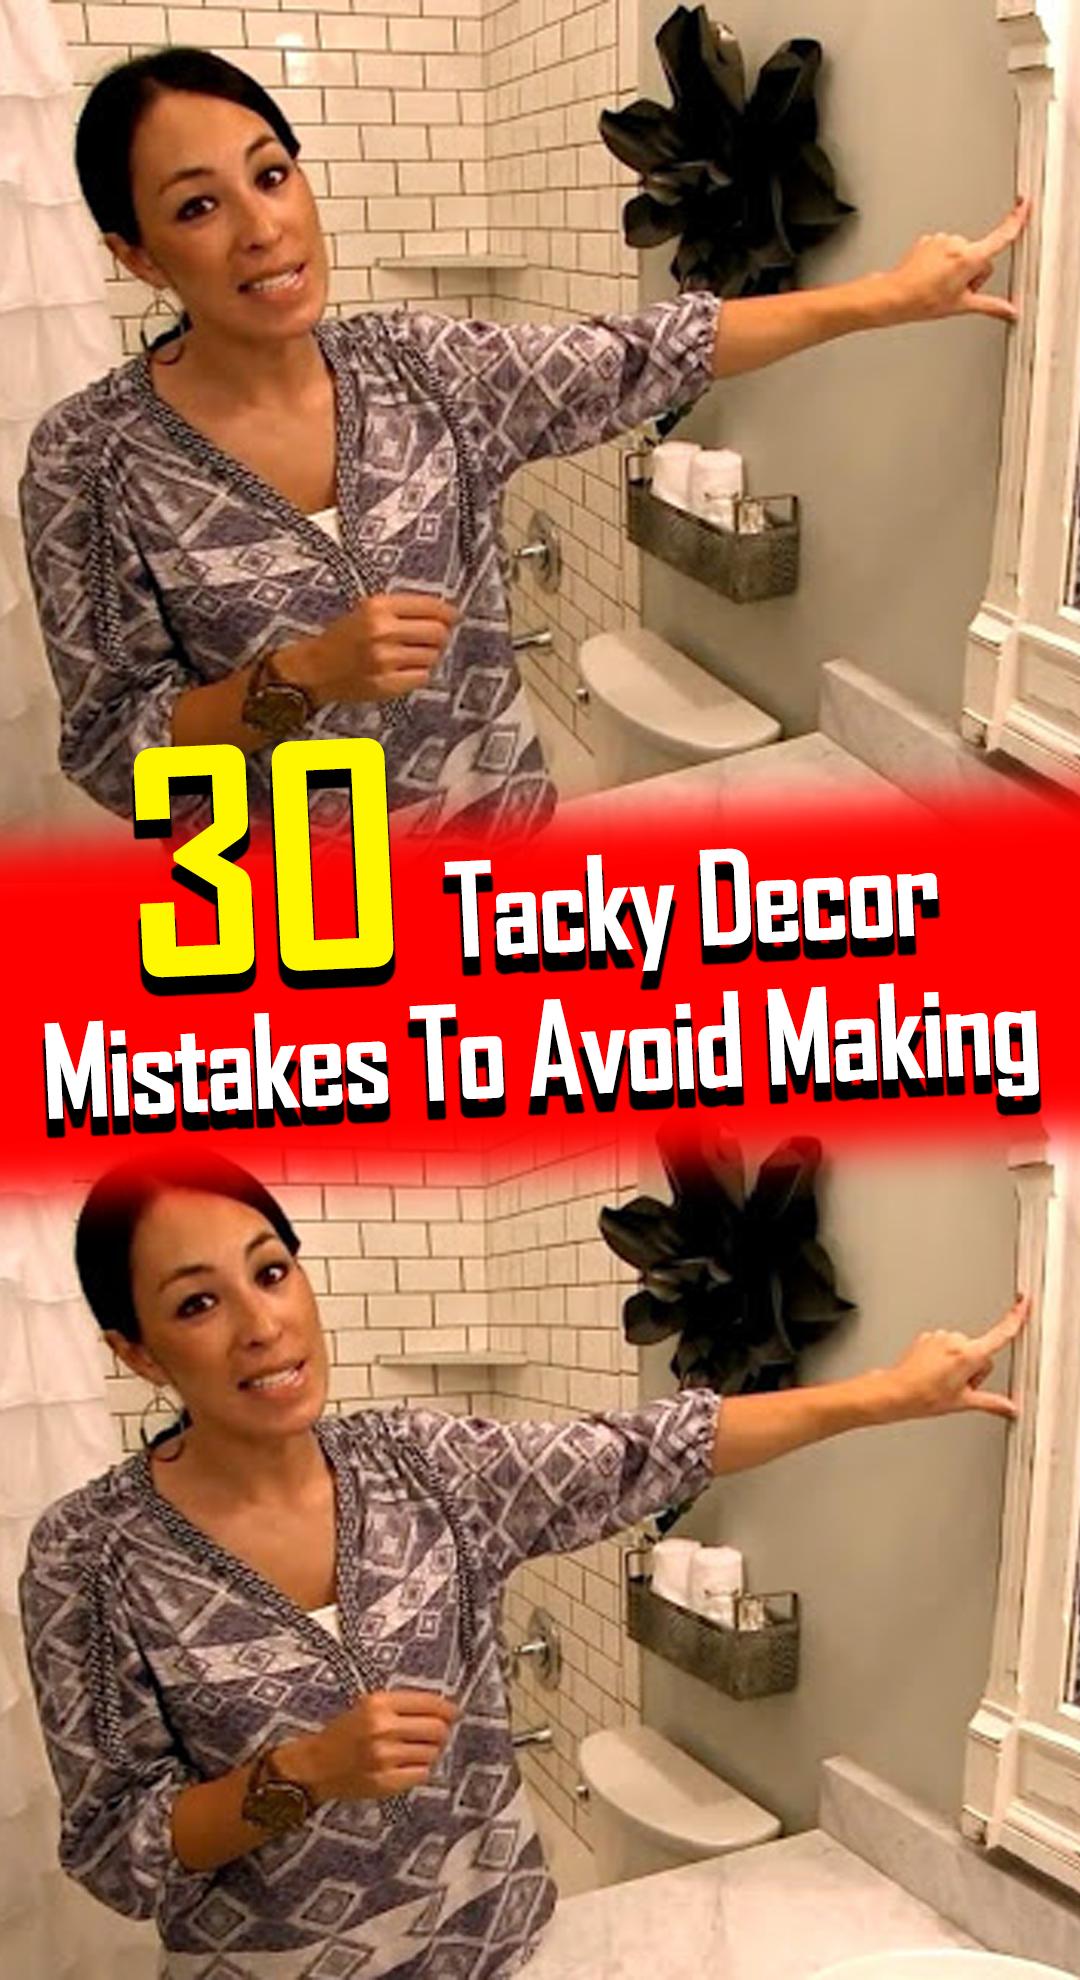 30 Tacky Decor Mistakes To Avoid Making